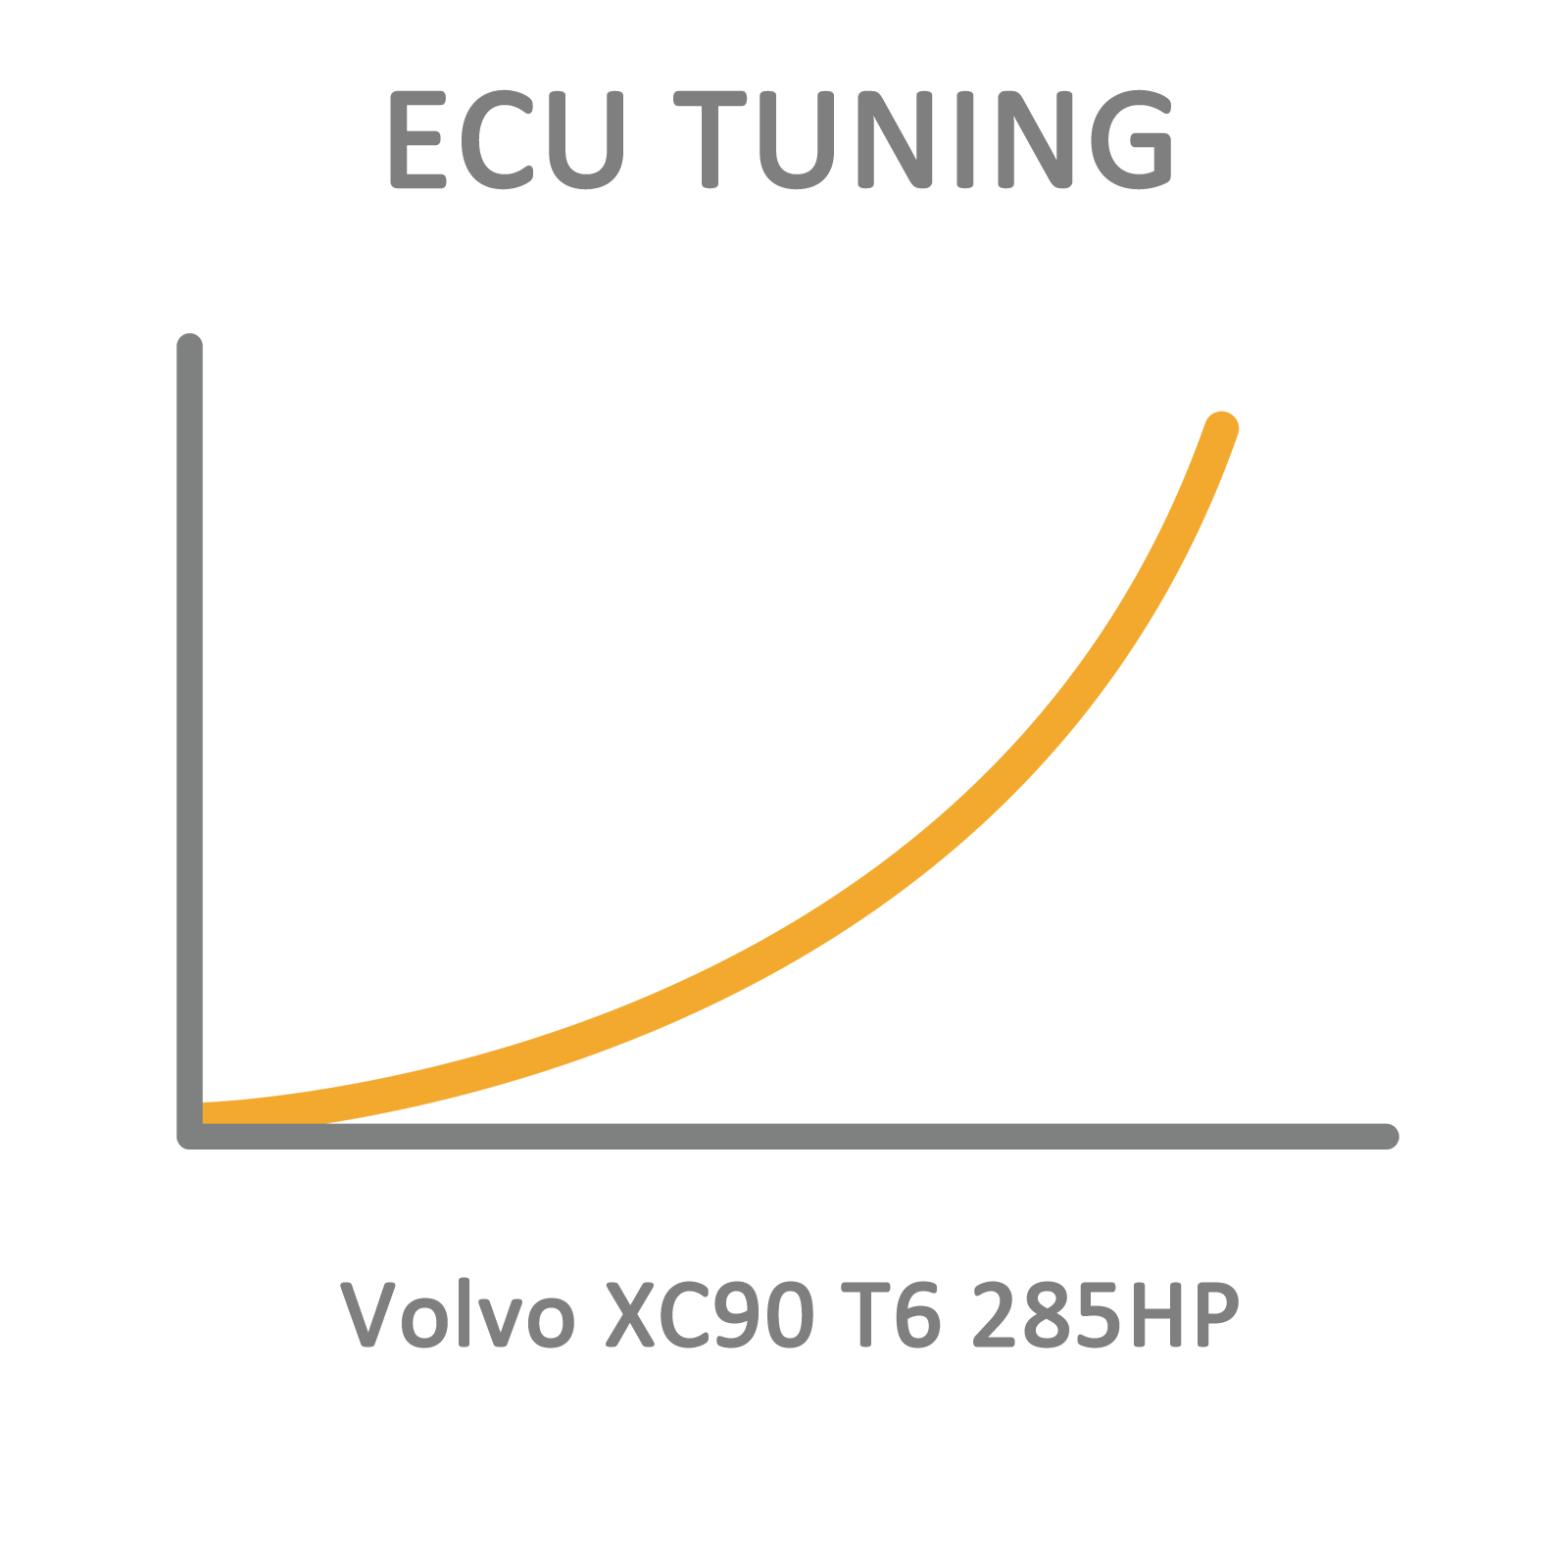 Volvo XC90 T6 285HP ECU Tuning Remapping Programming